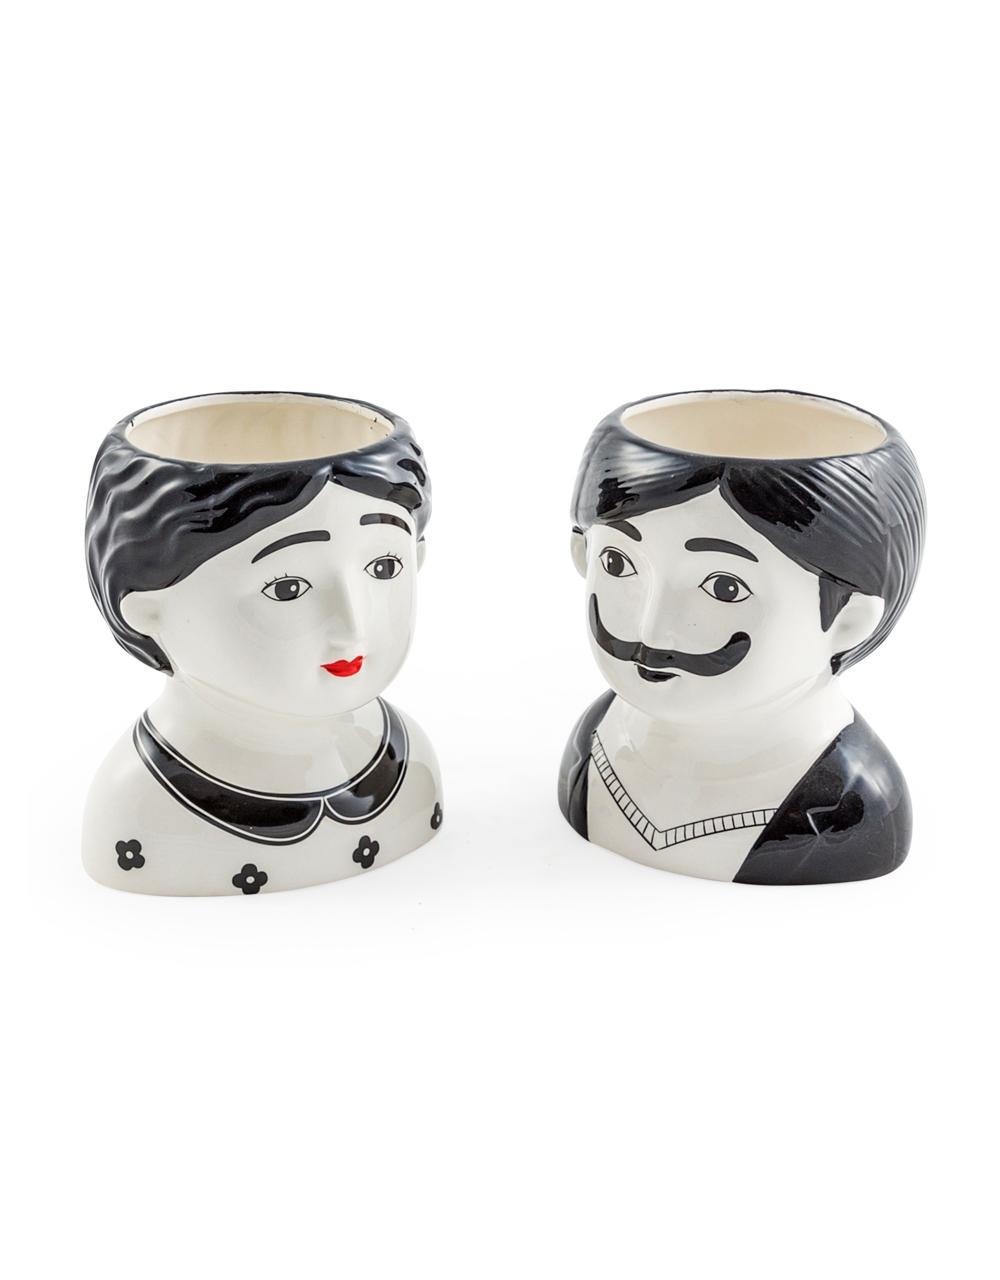 Large Man & Woman Pots Set of 2